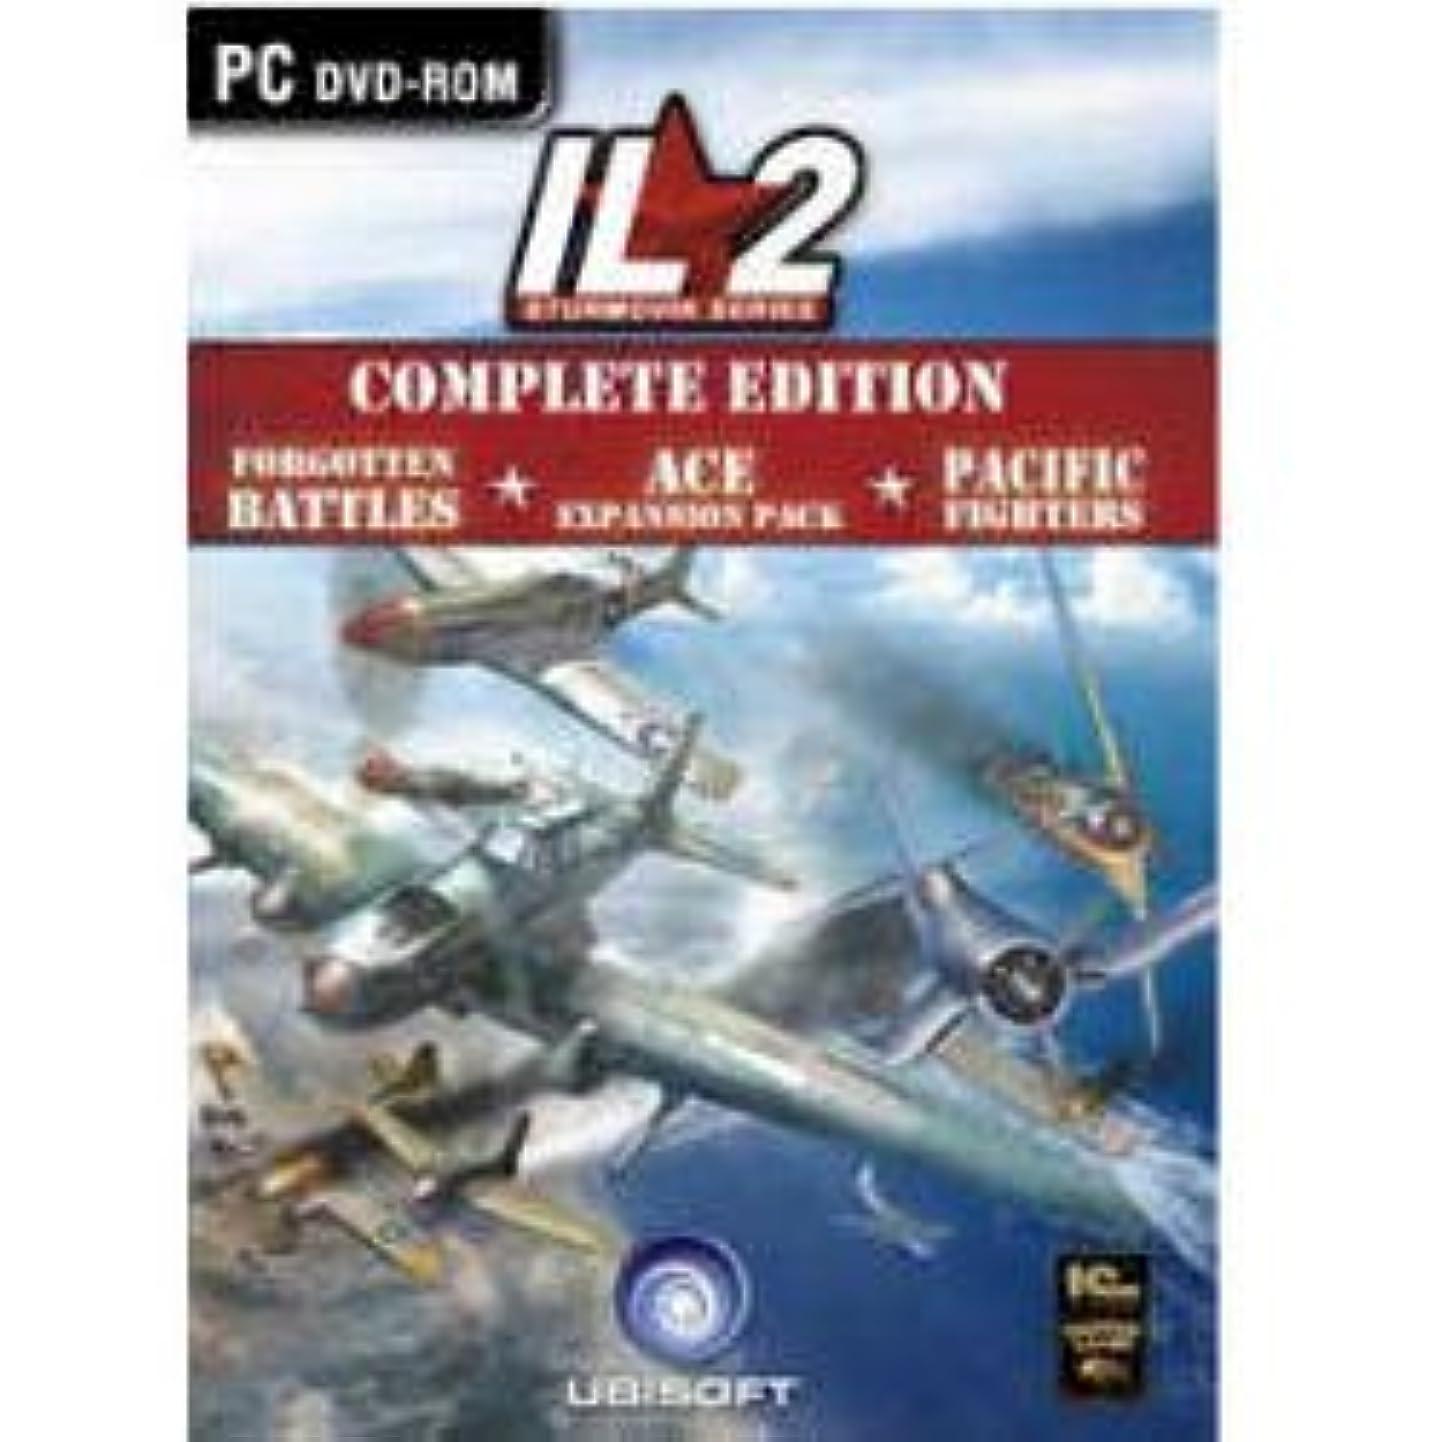 IL-2 COMPLETE EDITION 英語版+日本語マニュアル